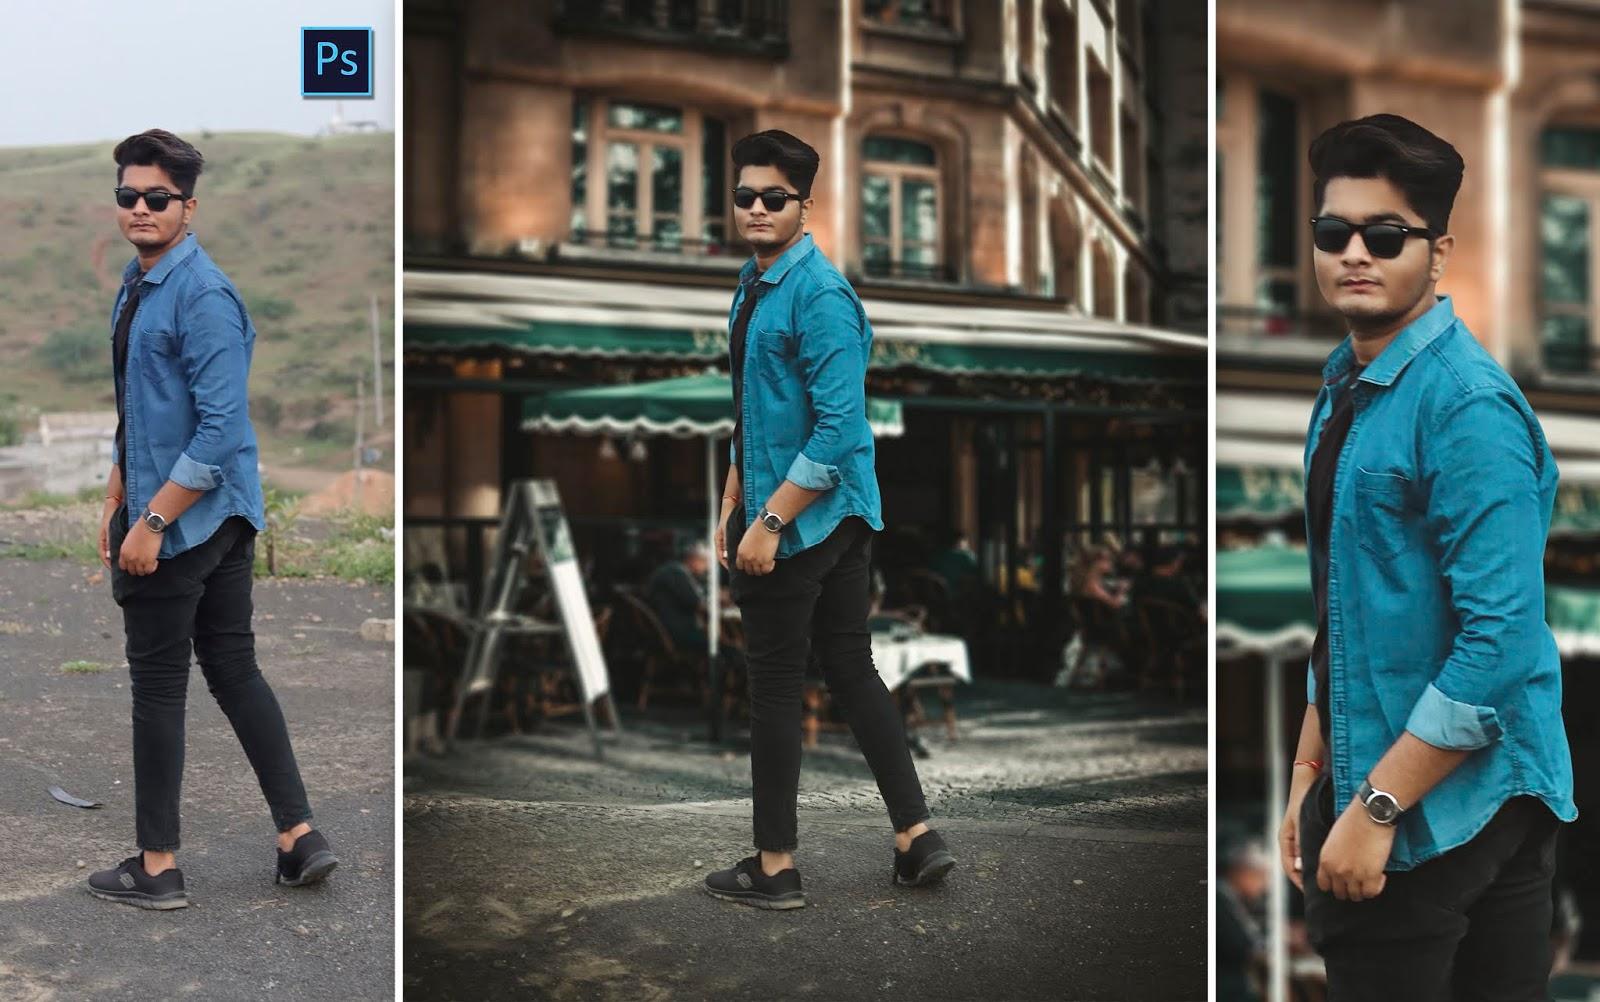 Creative Stylish Photo Manipulation for Instagram in Photoshop cc